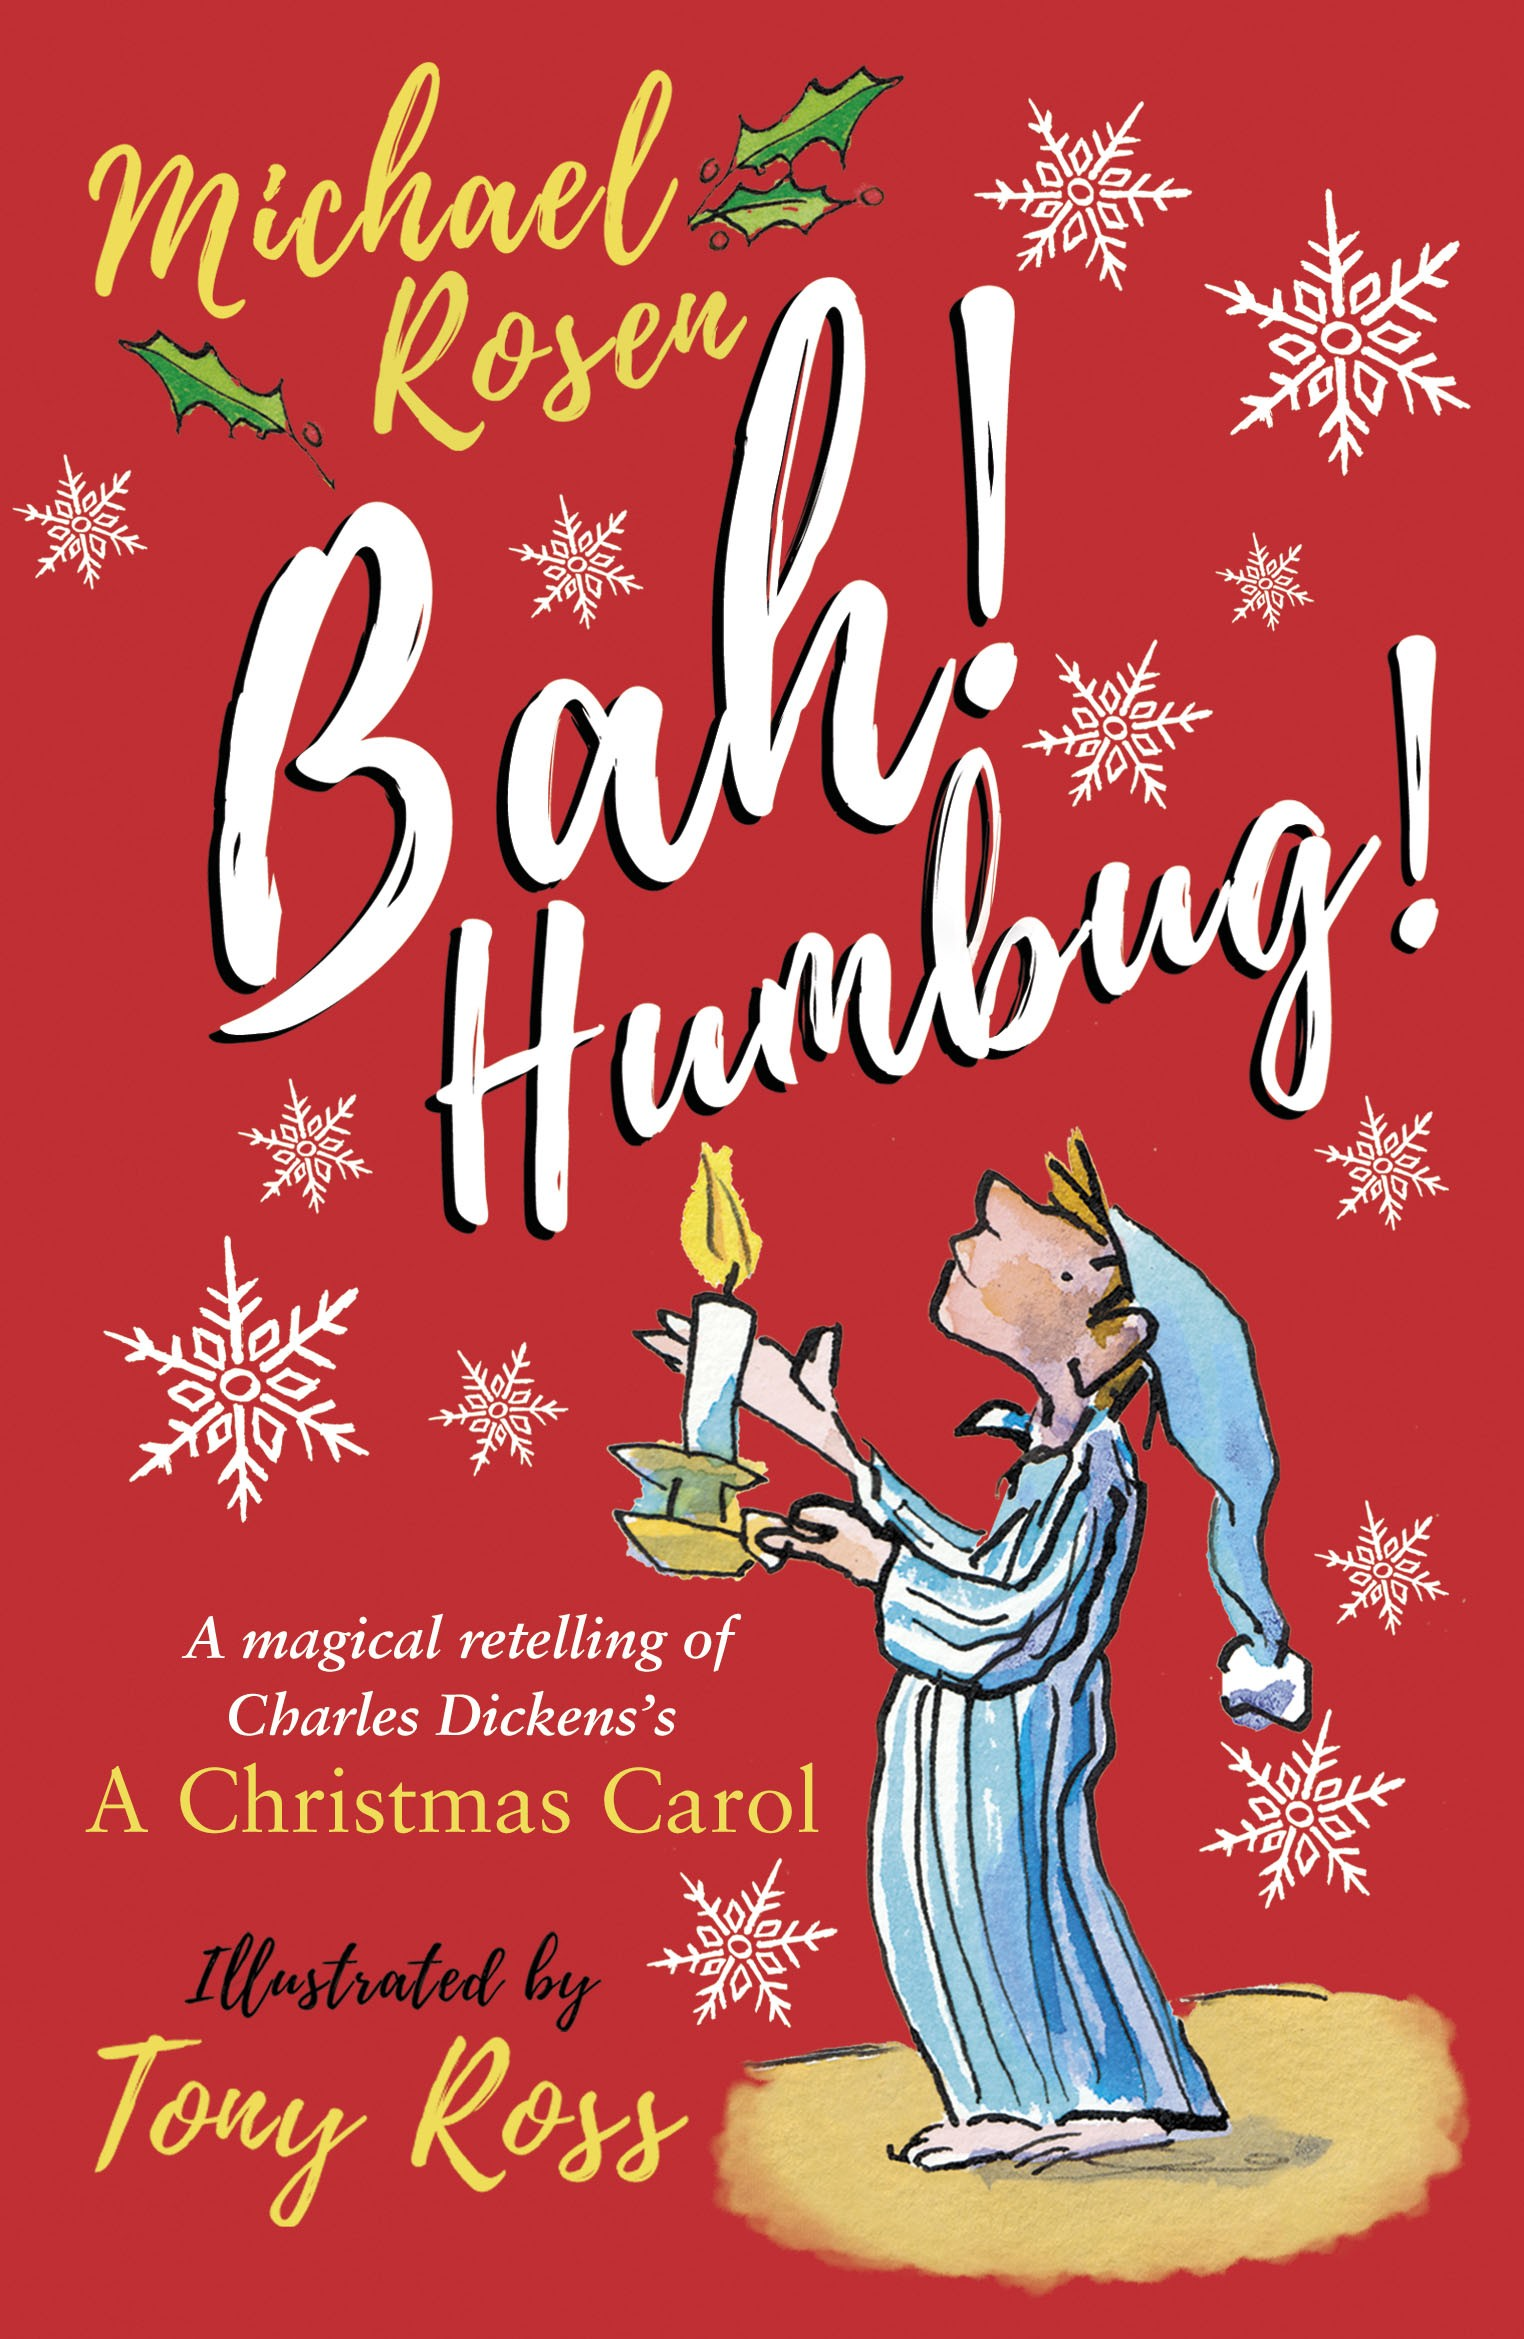 Michael Rosen on the rewriting of A Christmas Carol